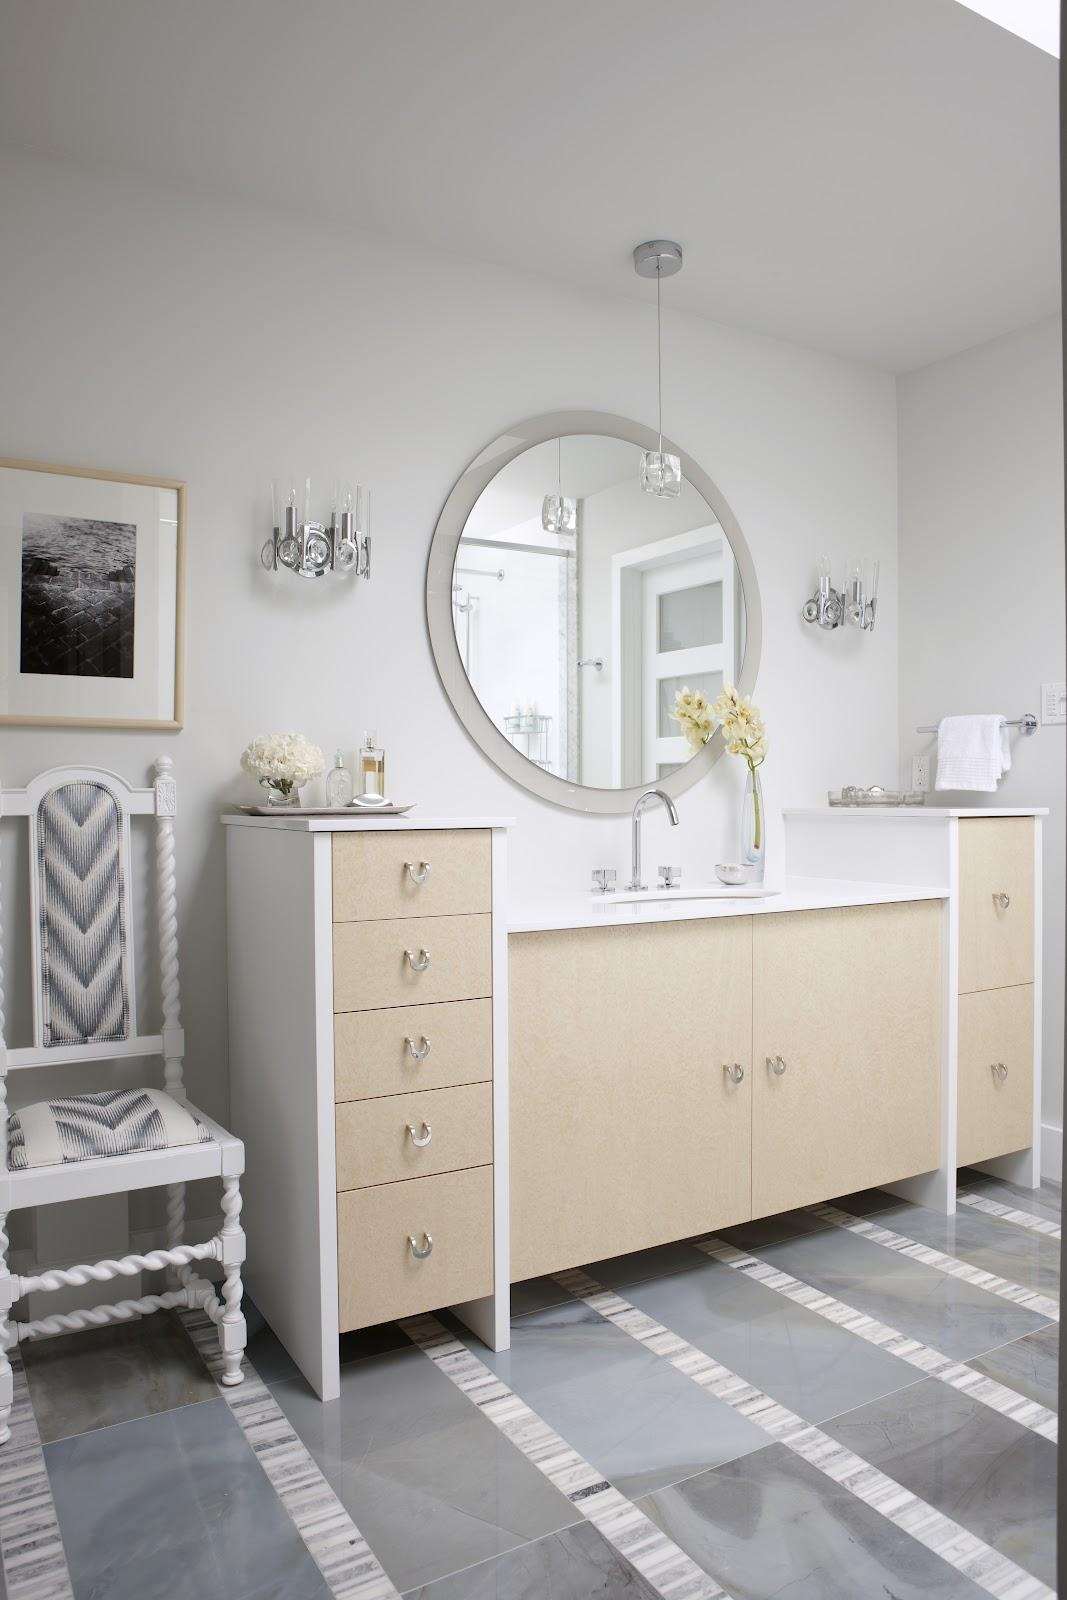 The tile shop design by kirsty georgian bathroom style - New Sarah Richardson Bath